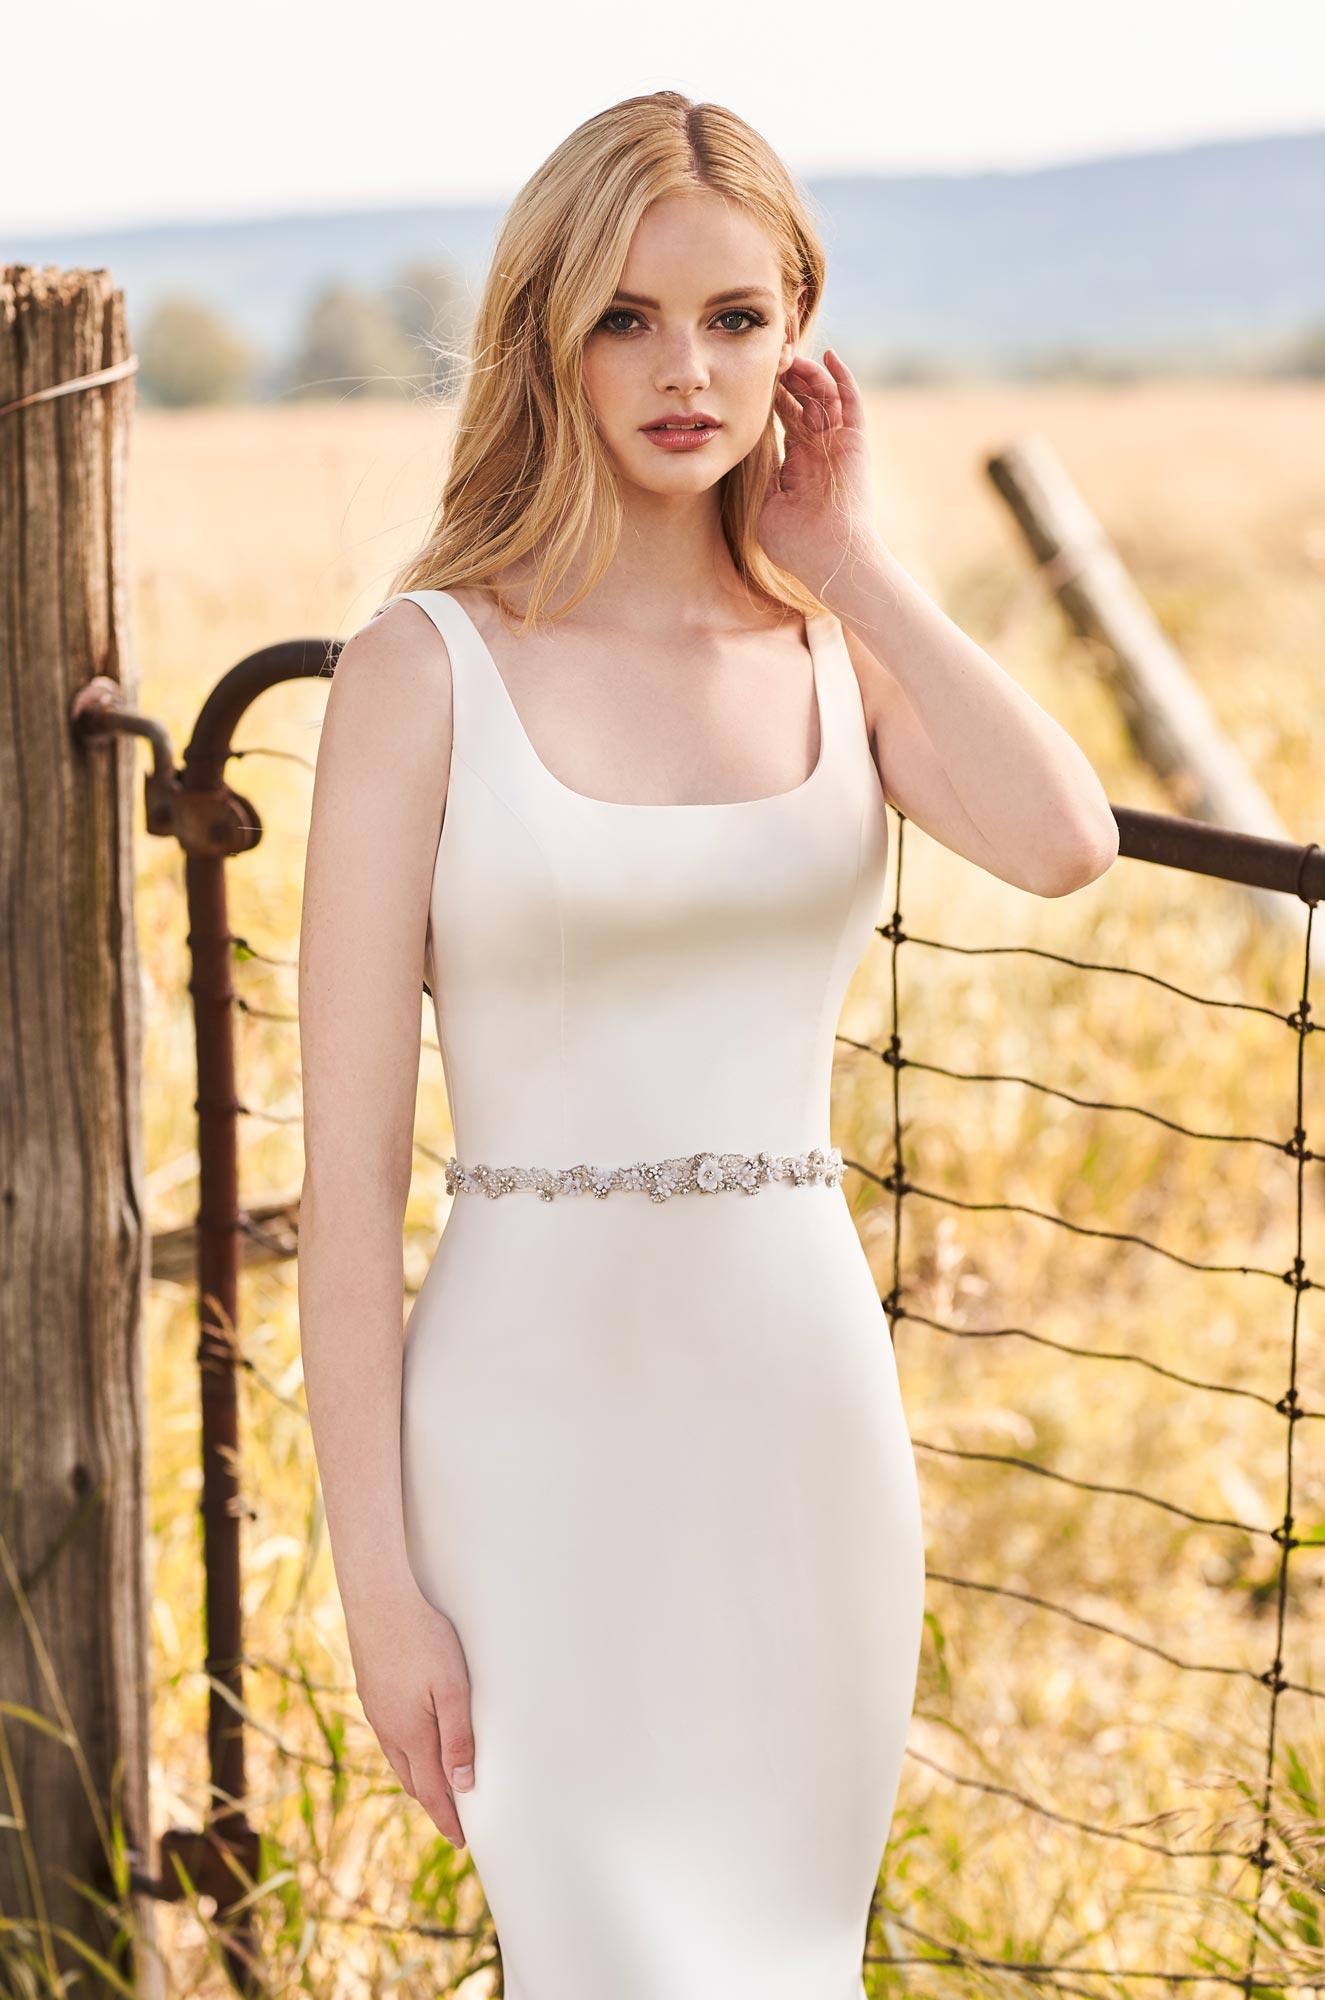 Glimmering Belt Wedding Dress – Style #2290 | Mikaella Bridal